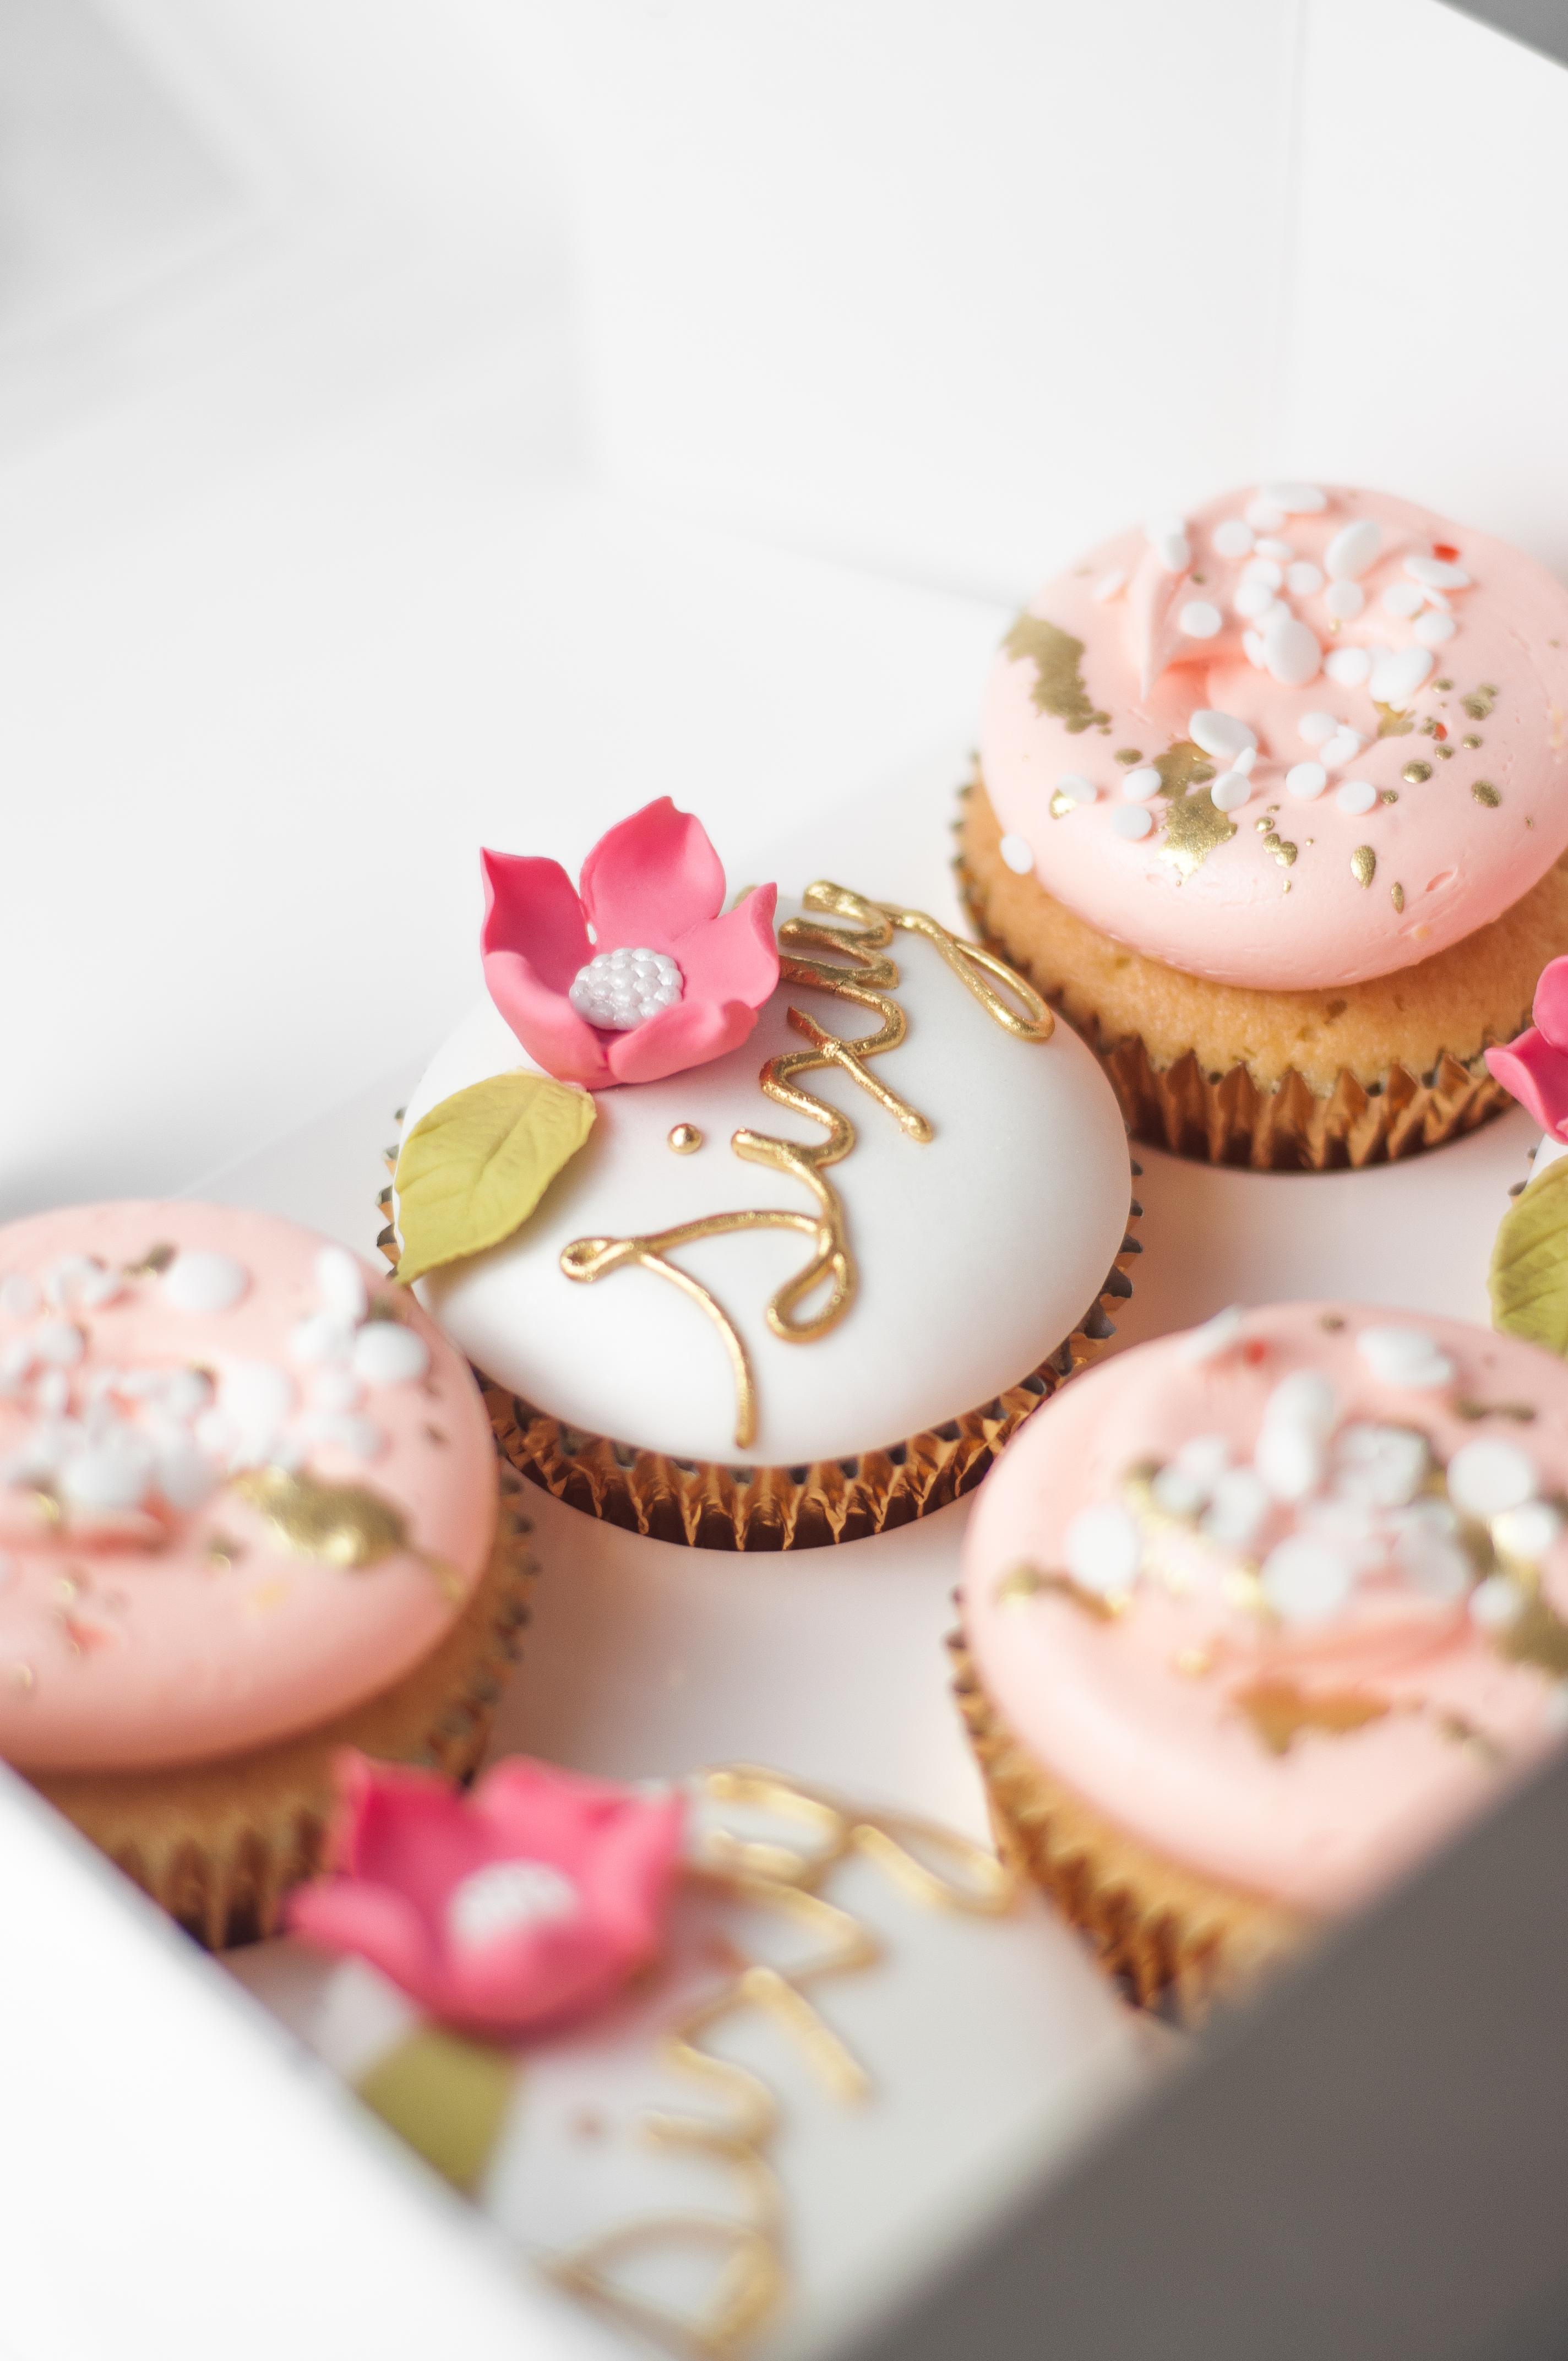 Peach and white elegant cupcakes